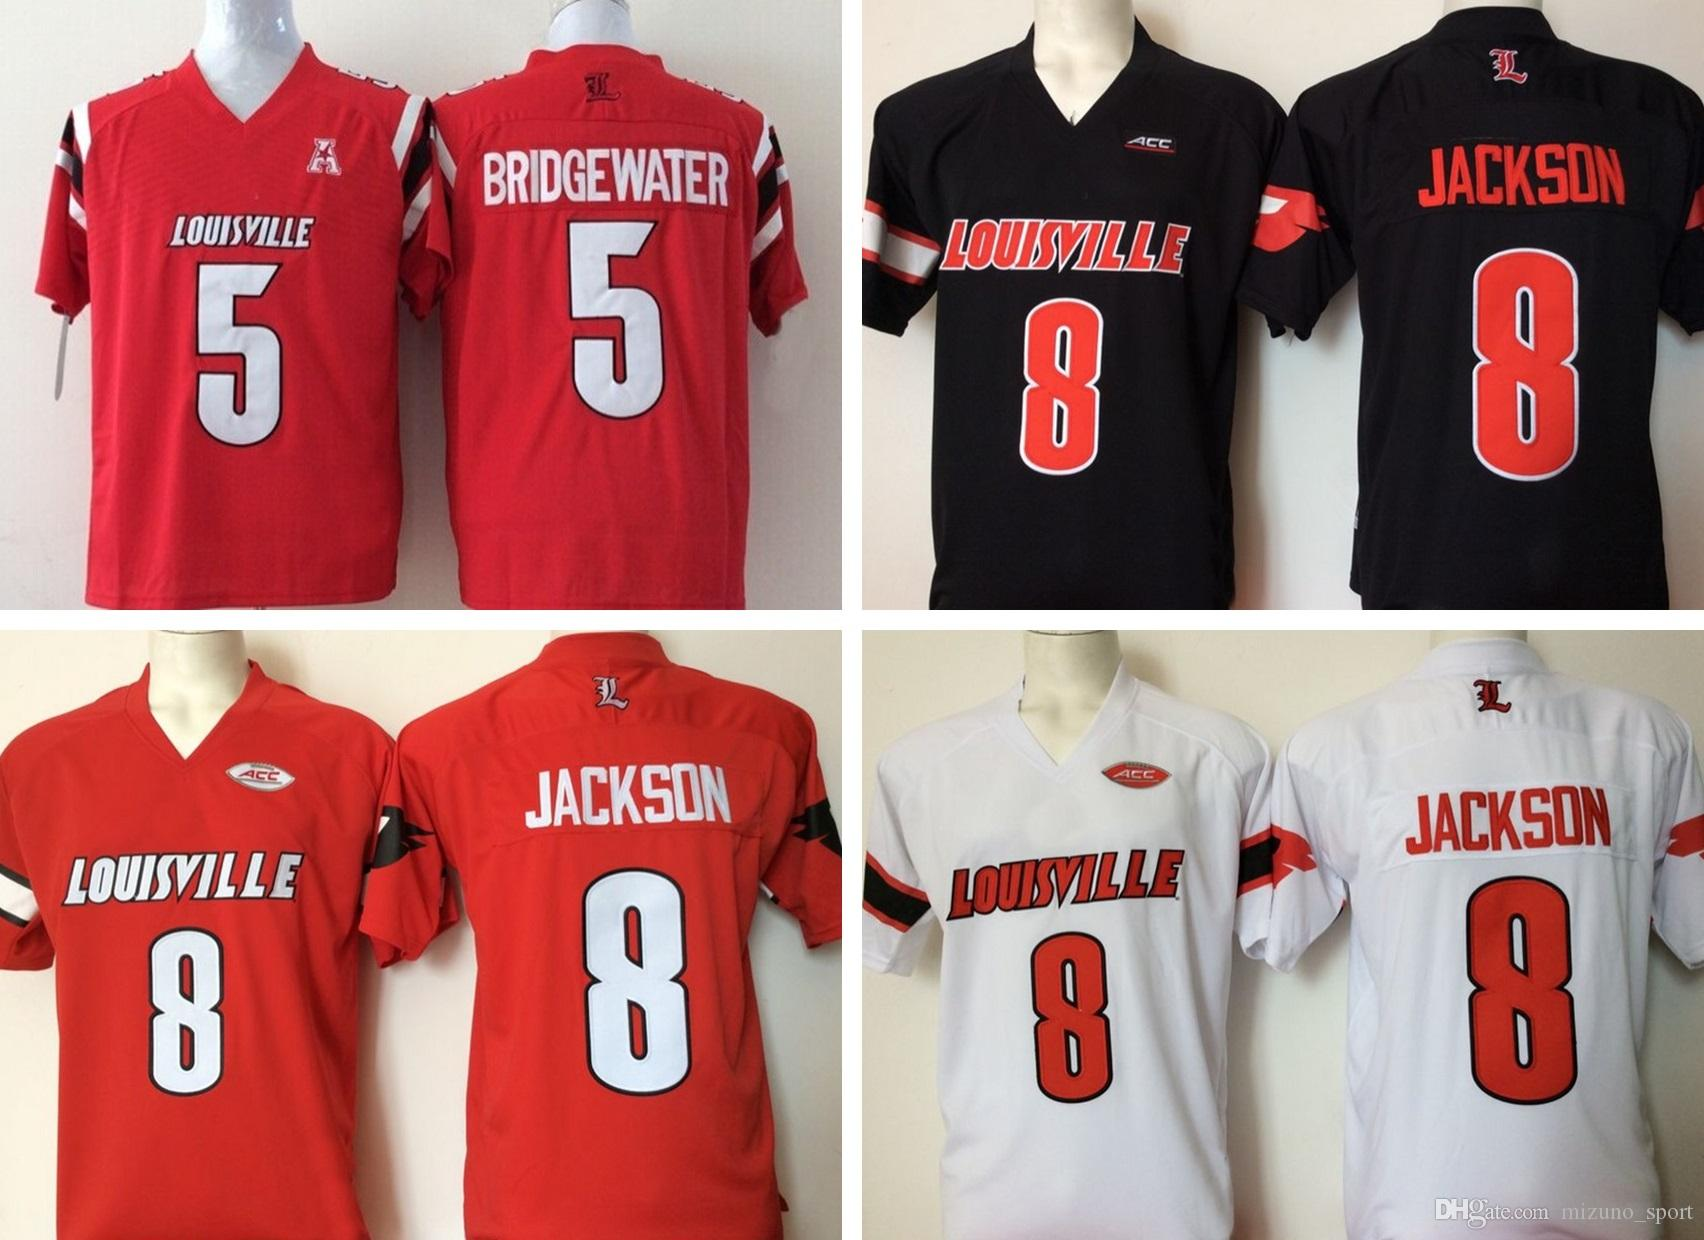 hot sale online 29882 f940f Cheap Ncaa Louisville Cardinals Red 8 Lamar Jackson 5 Bridgewater 2017 New  Style Mens College Football Jersey Men Jerseys